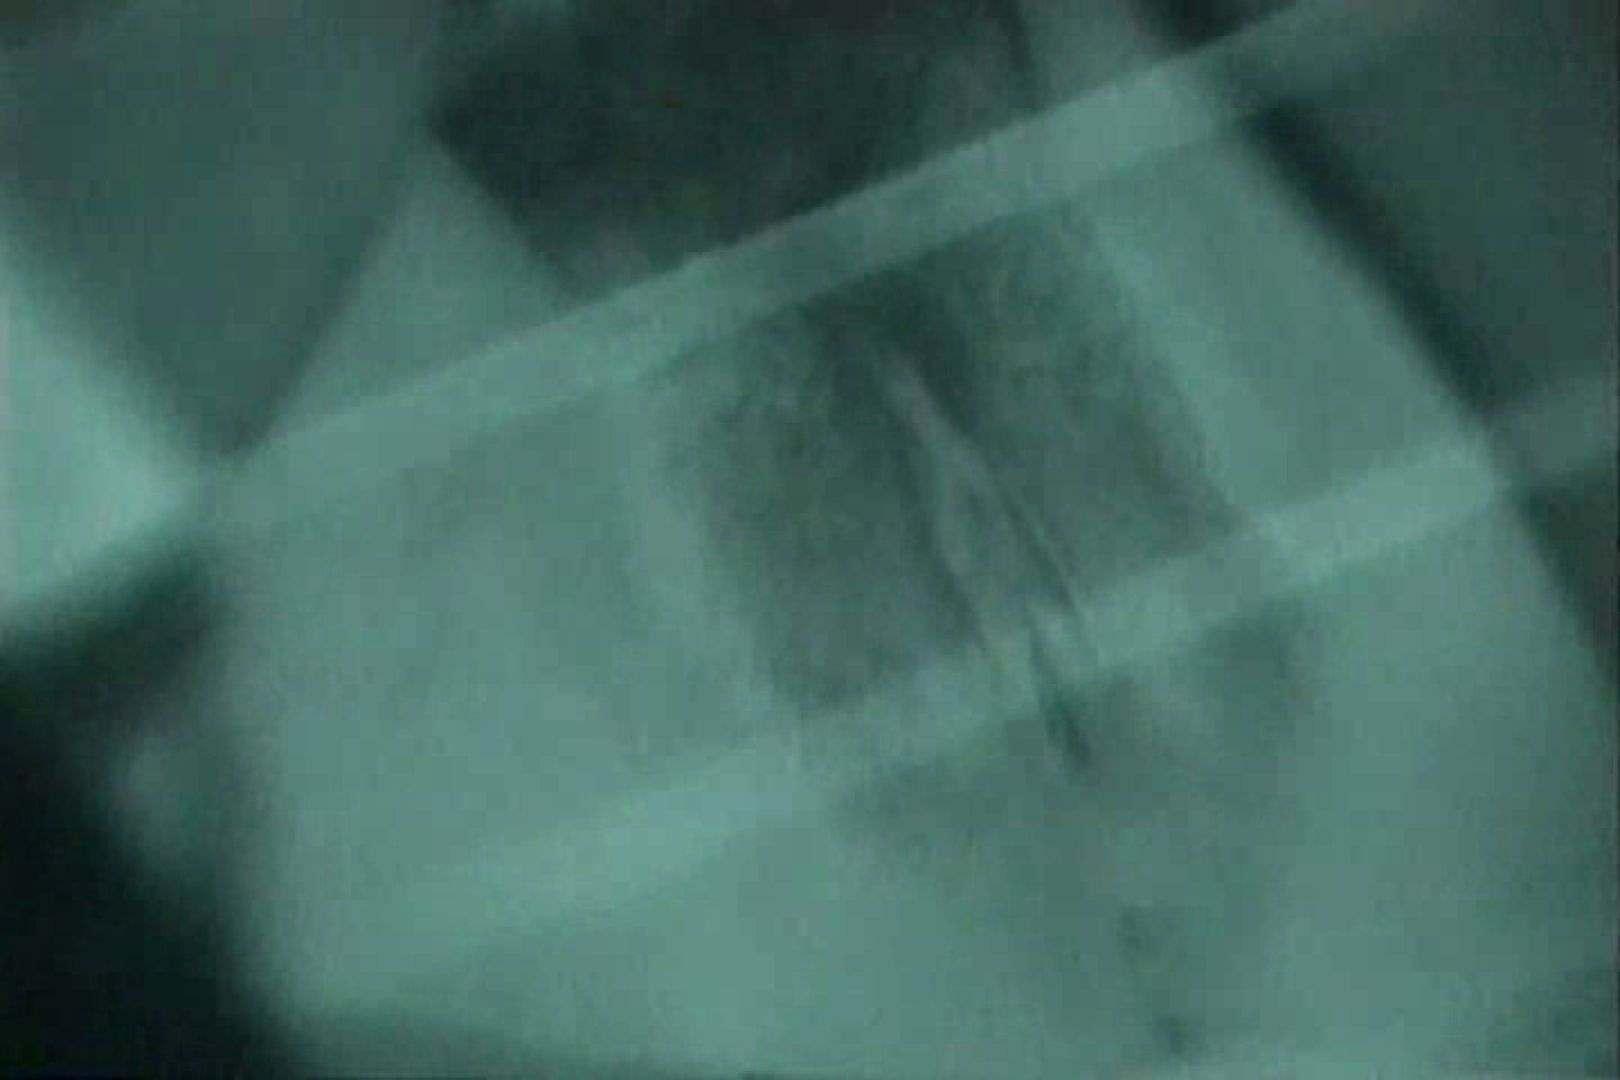 充血監督の深夜の運動会Vol.125 巨乳  59画像 32